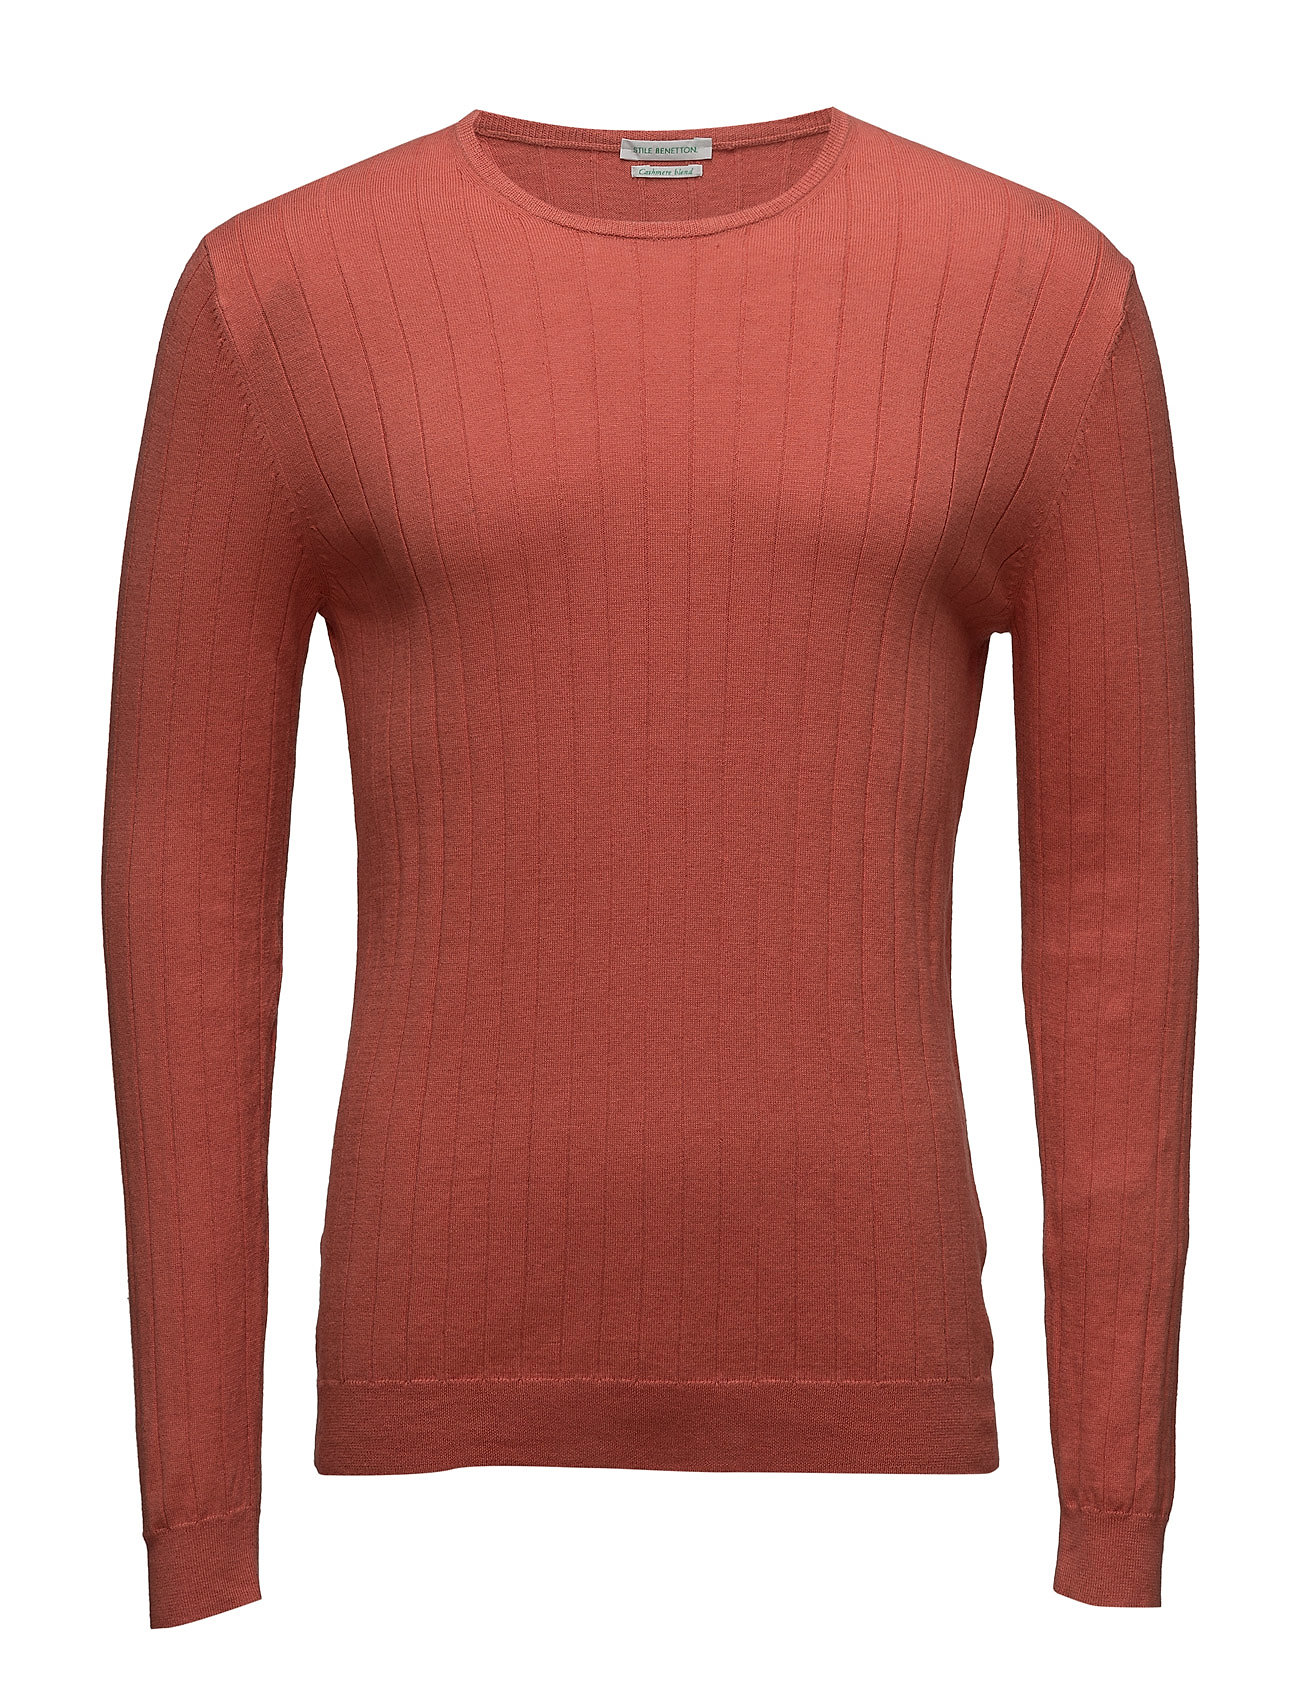 Sweater L/S United Colors of Benetton Runda Necked